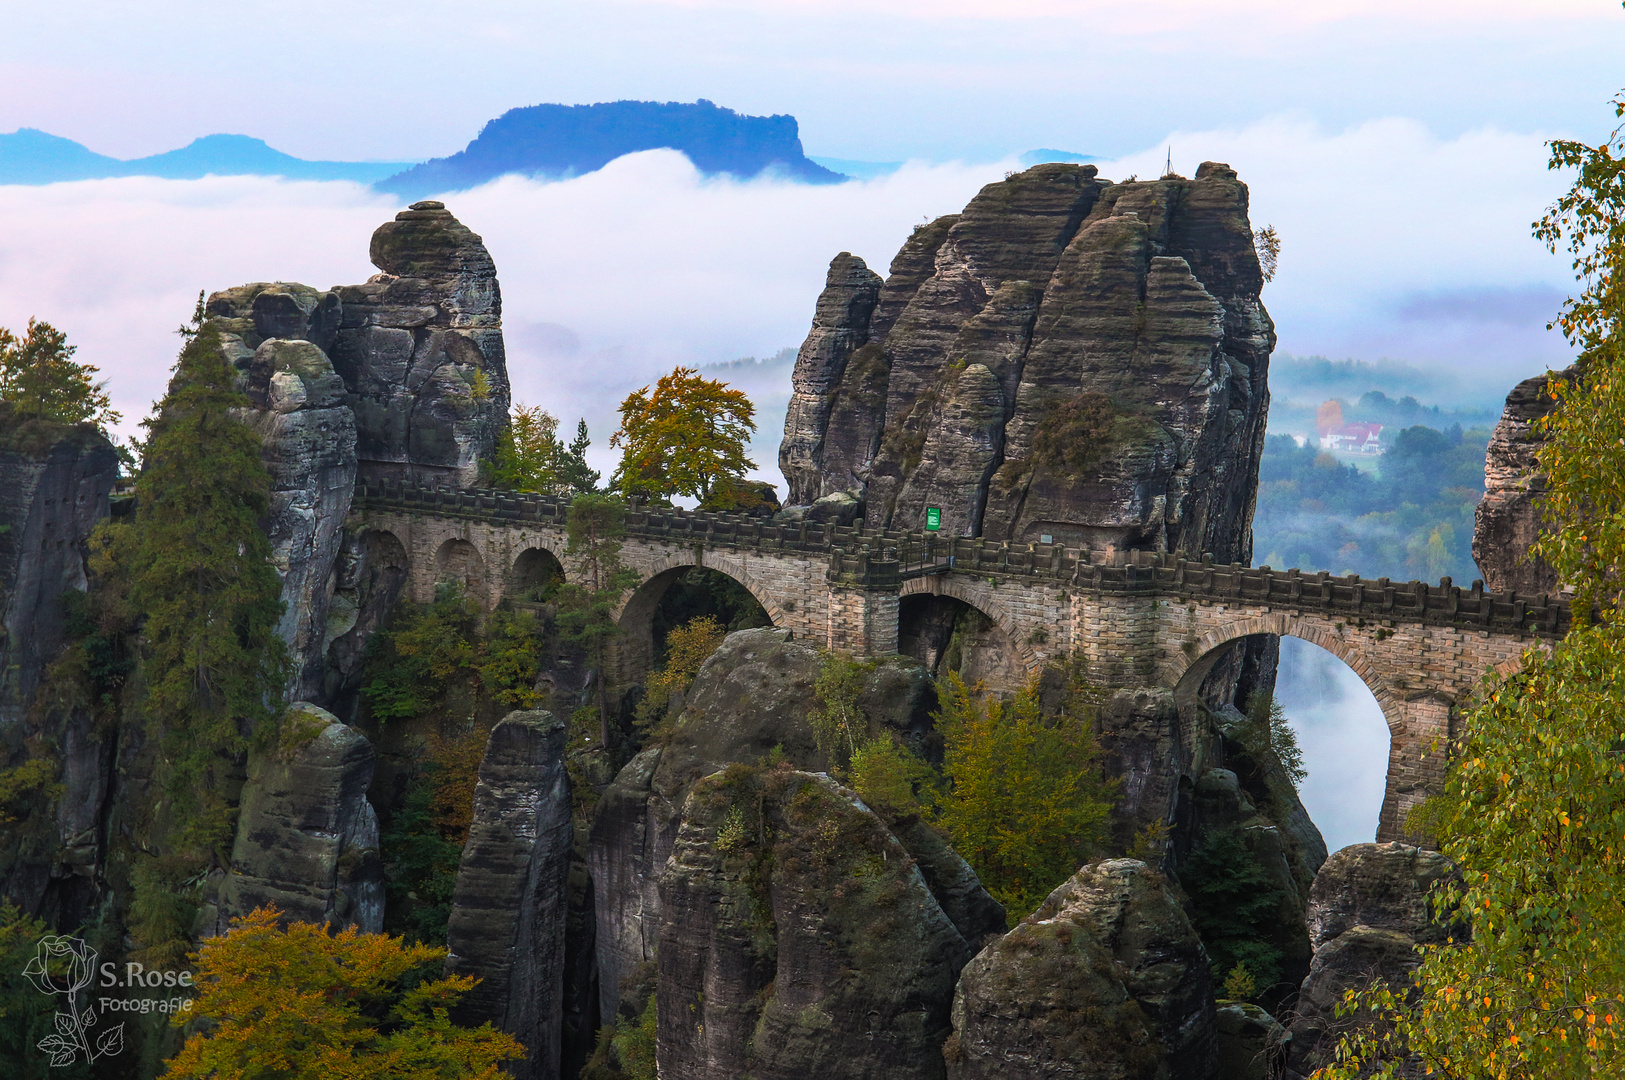 Felsenfestung Bastei bei Nebel